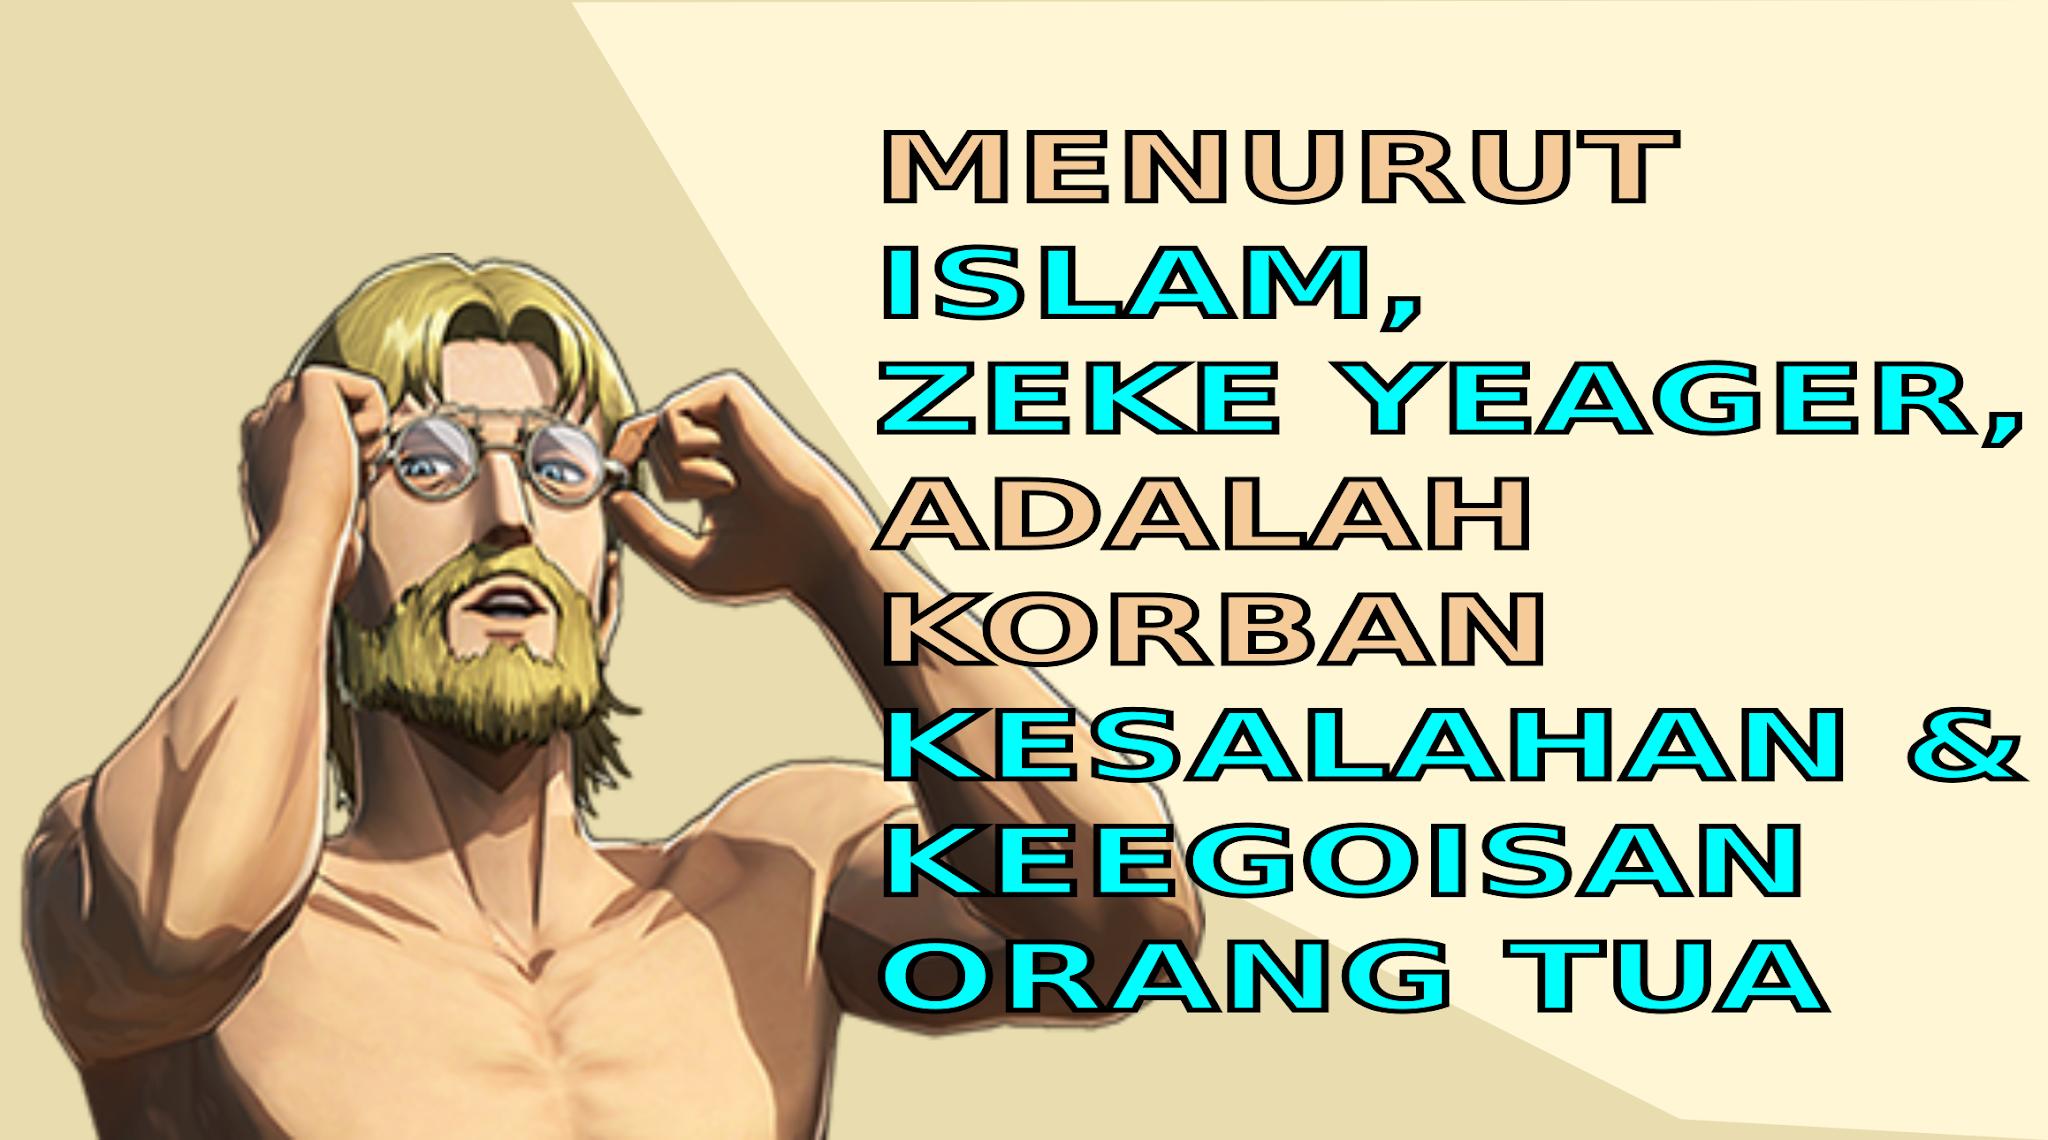 Menurut Islam, Zeke Yeager adalah korban keegoisan orang tua